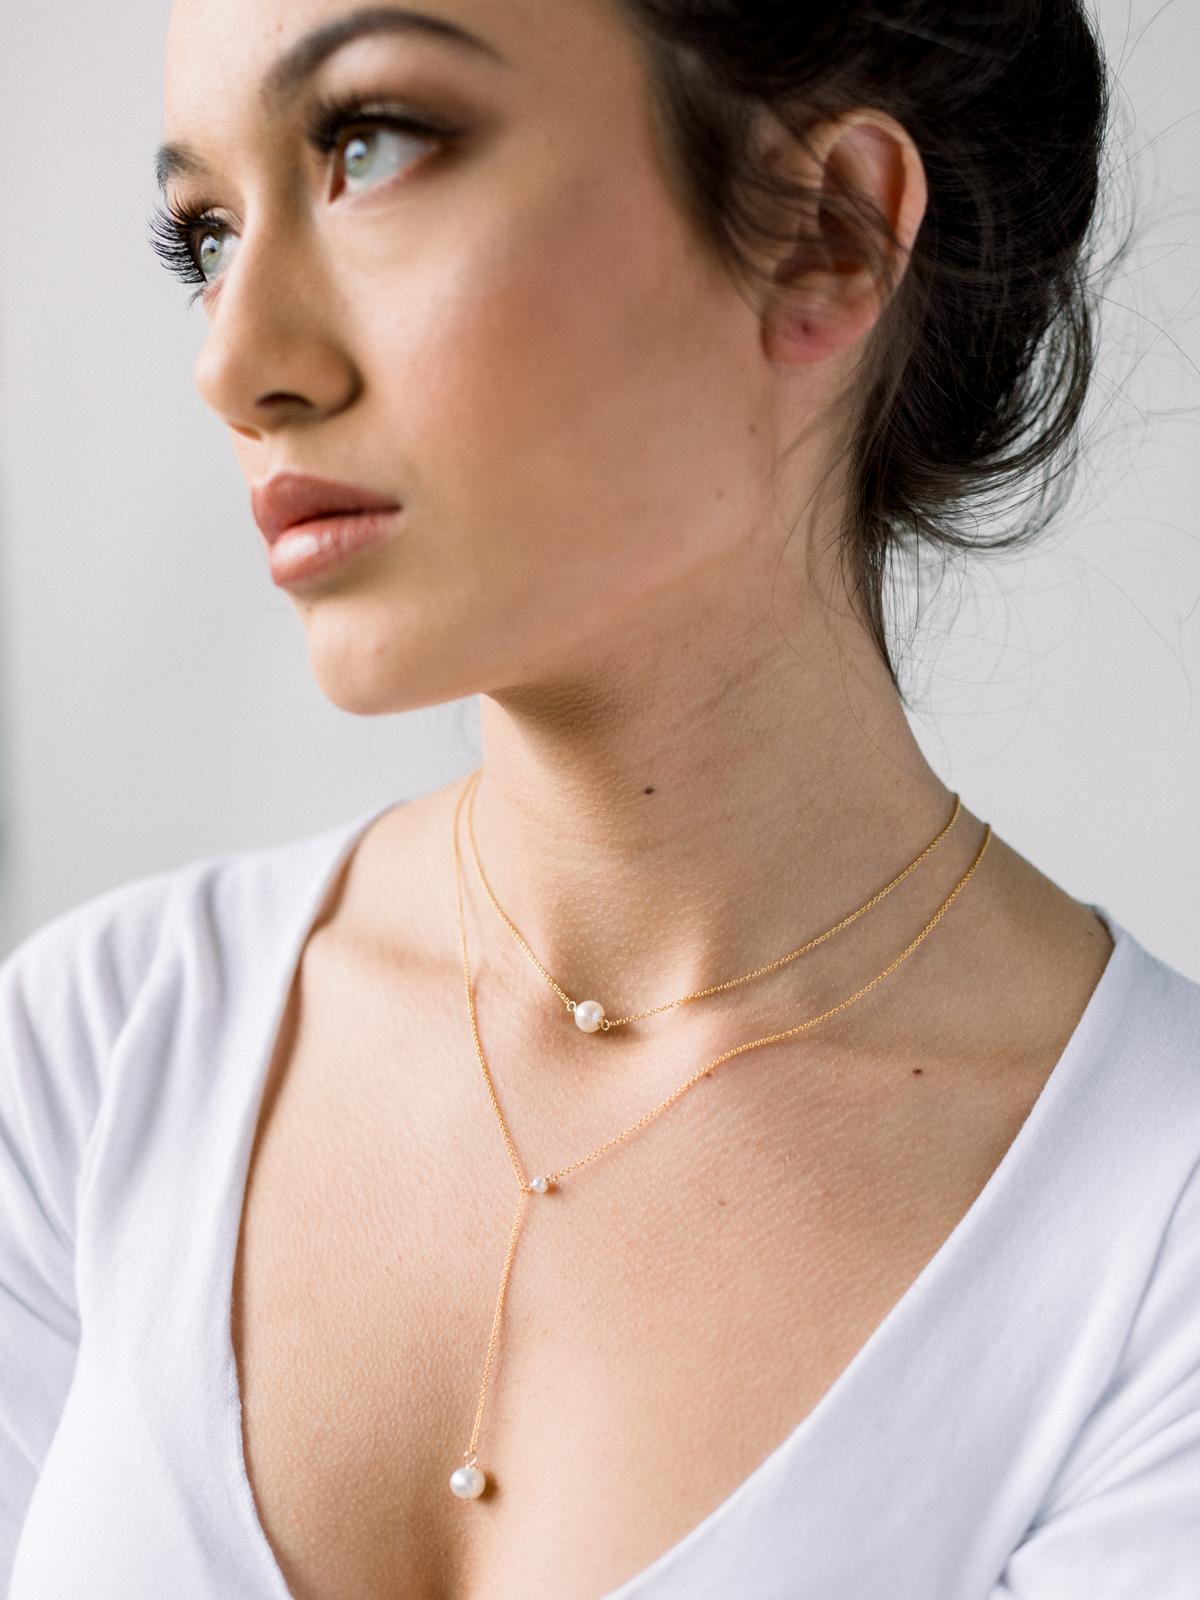 190217-0025-Rachelle-Celine-Handmade-Jewelry-DC-Elisenda-Llinares